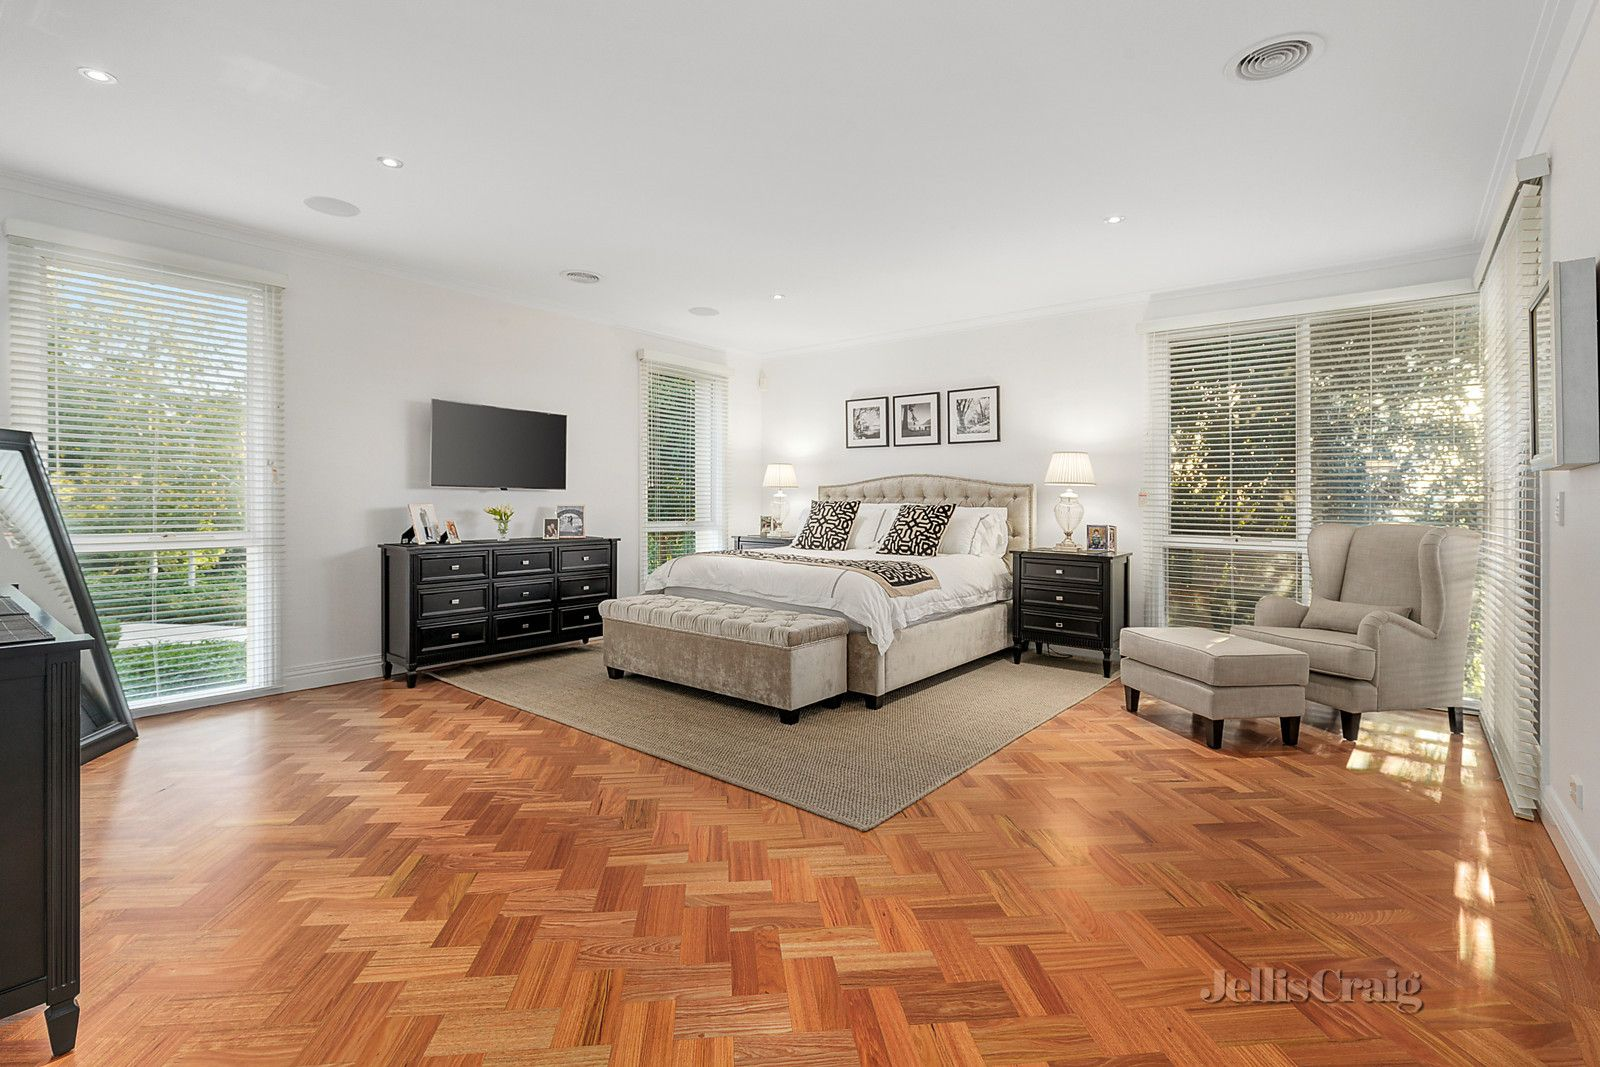 68 Websters Road Templestowe 3106 VIC House for Sale - jelliscraig.com.au